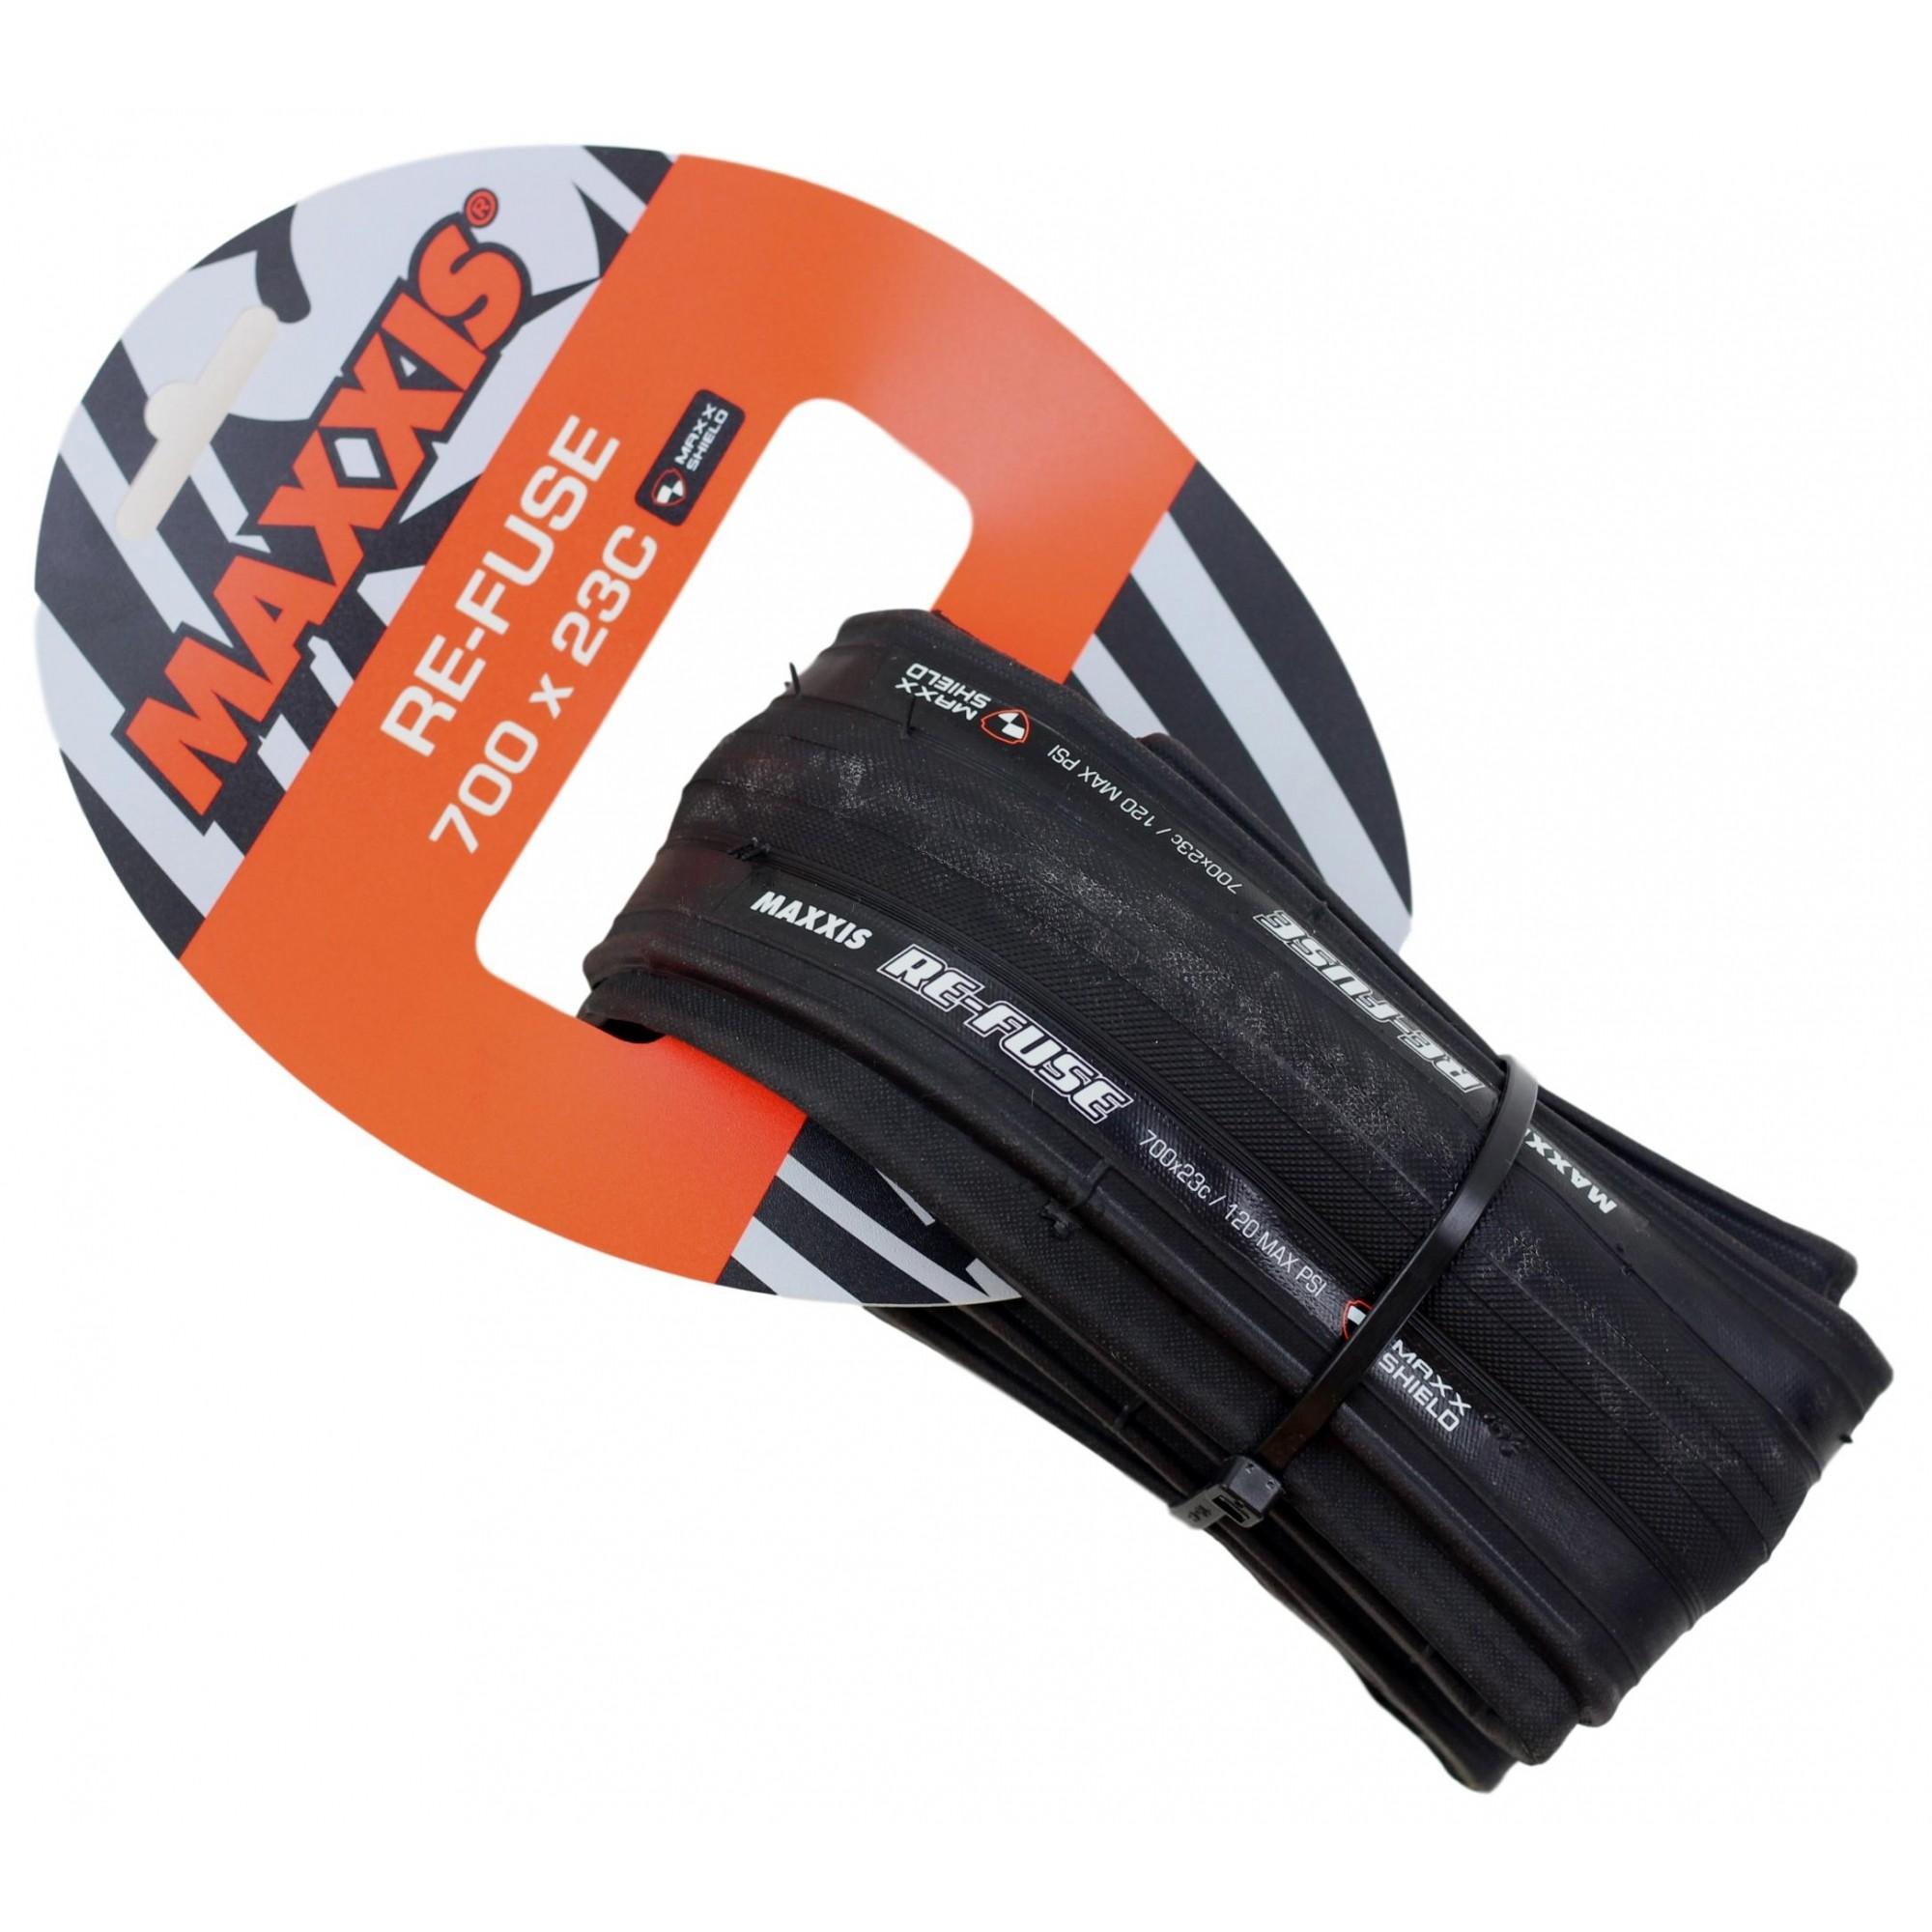 Pneu Bicicleta Speed Maxxis Refuse 700x23 Dobravél em Kevlar Preto Road 60tpi